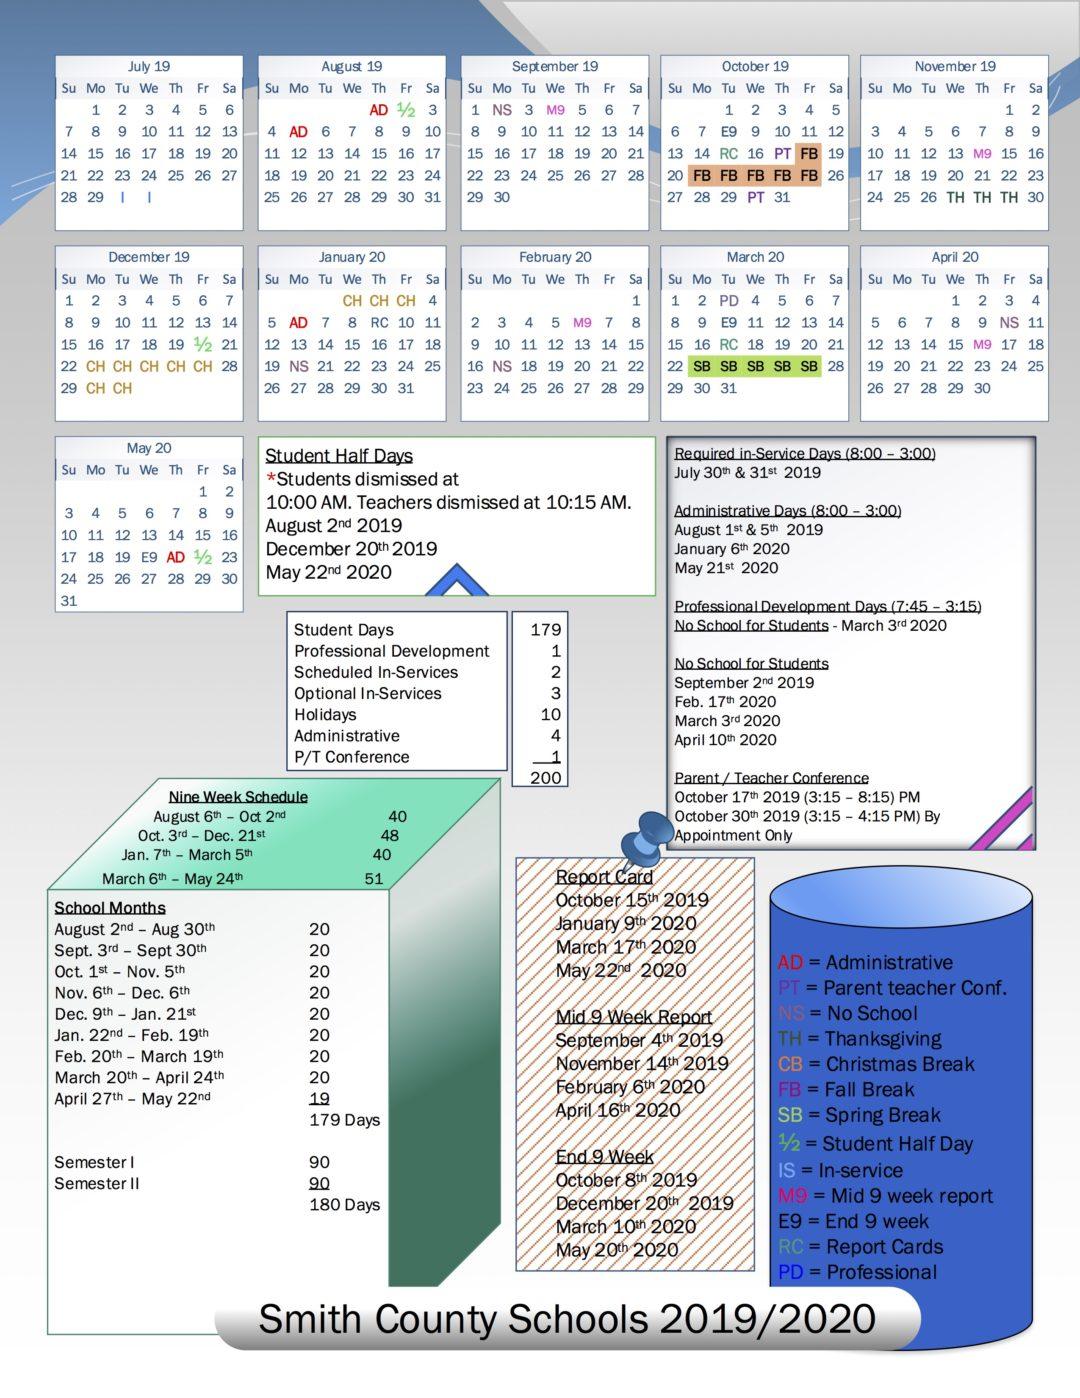 Back To School In Smith County! 2019 2020 School Calendar Pertaining To Doe School Calnder 2015 2020